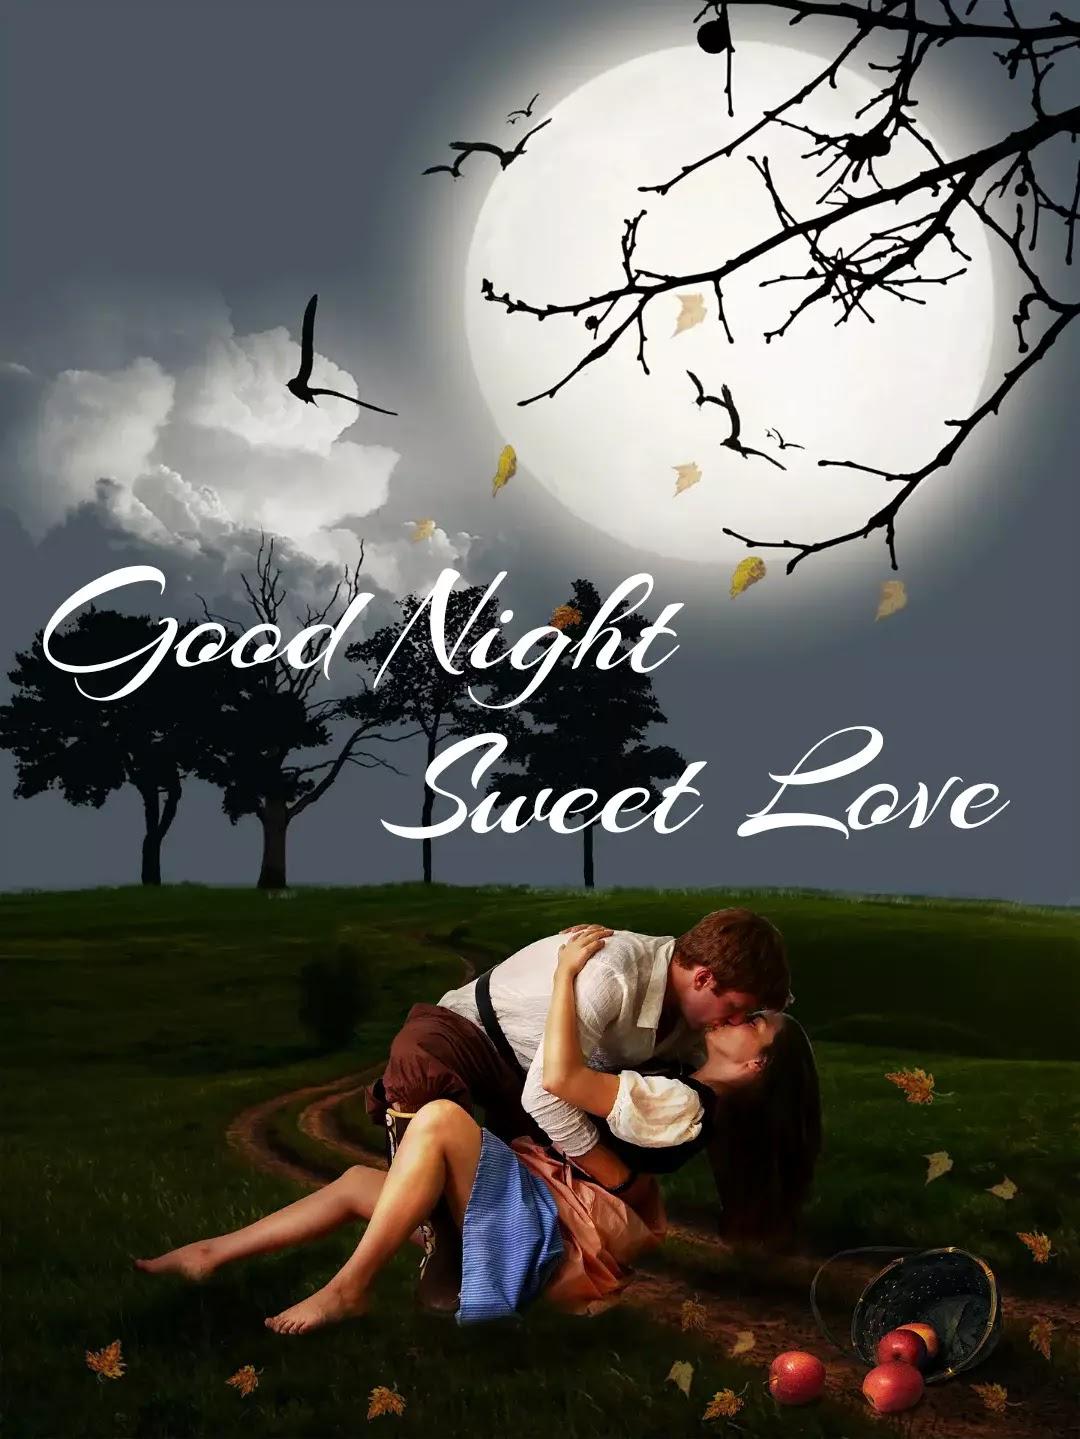 Night hug good Is It